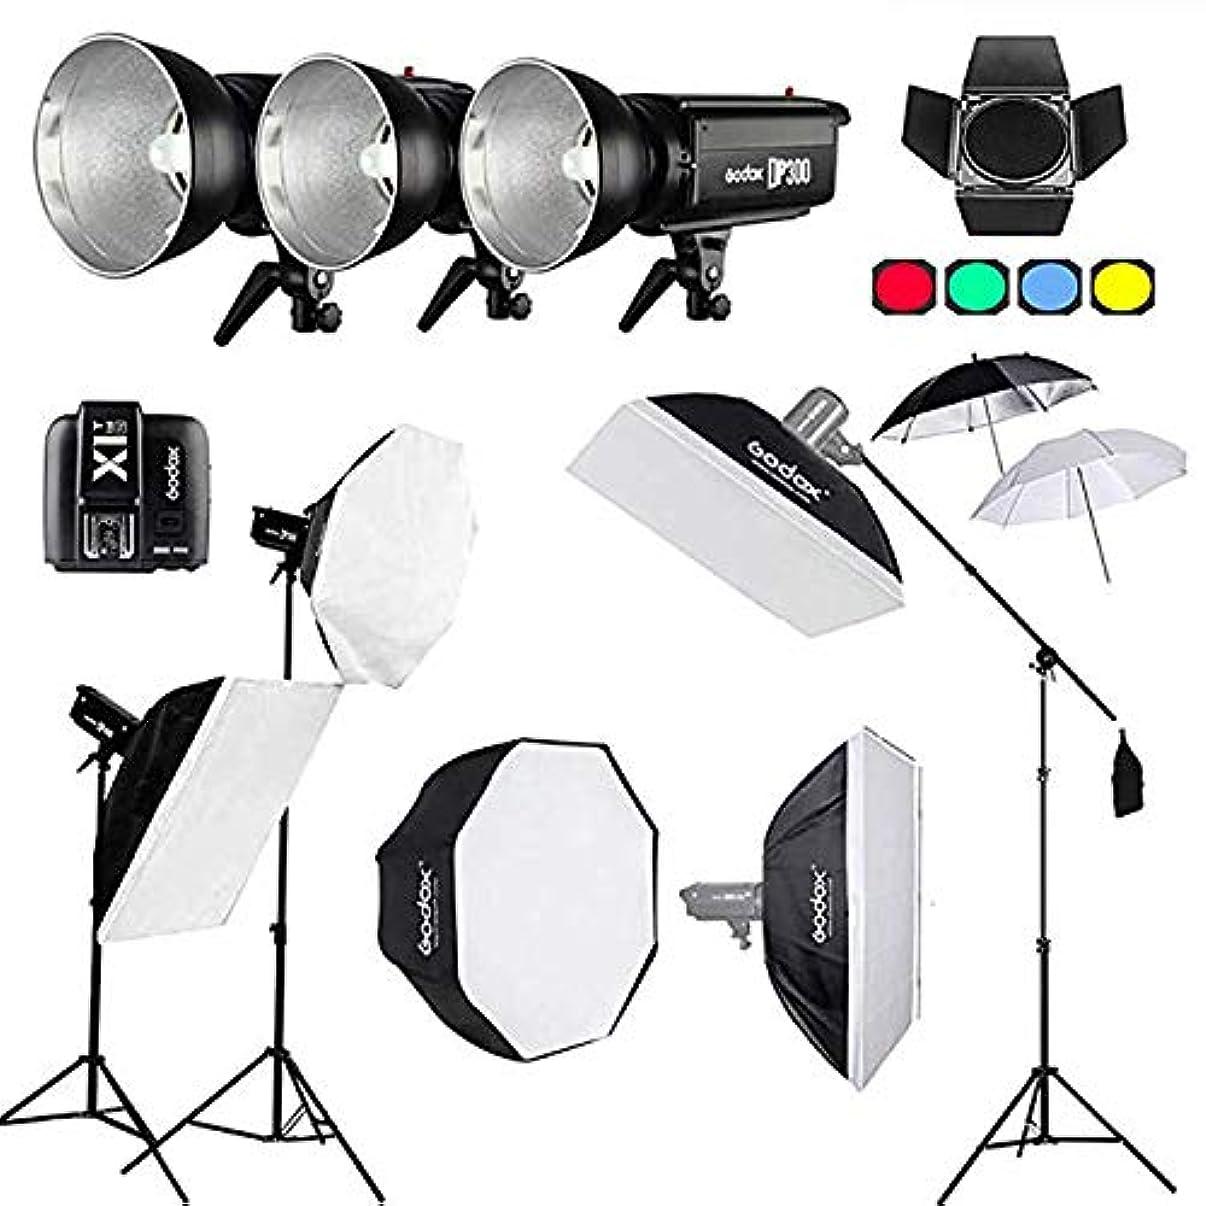 Godox 900Ws DP300II 3X 300Ws Professional Photo Studio Flash Lighting Set with Softbox,Light Stand, Flash Trigger,Studio Boom Arm Top Light Stand for Wedding Photography, Beauty Light, Night Video